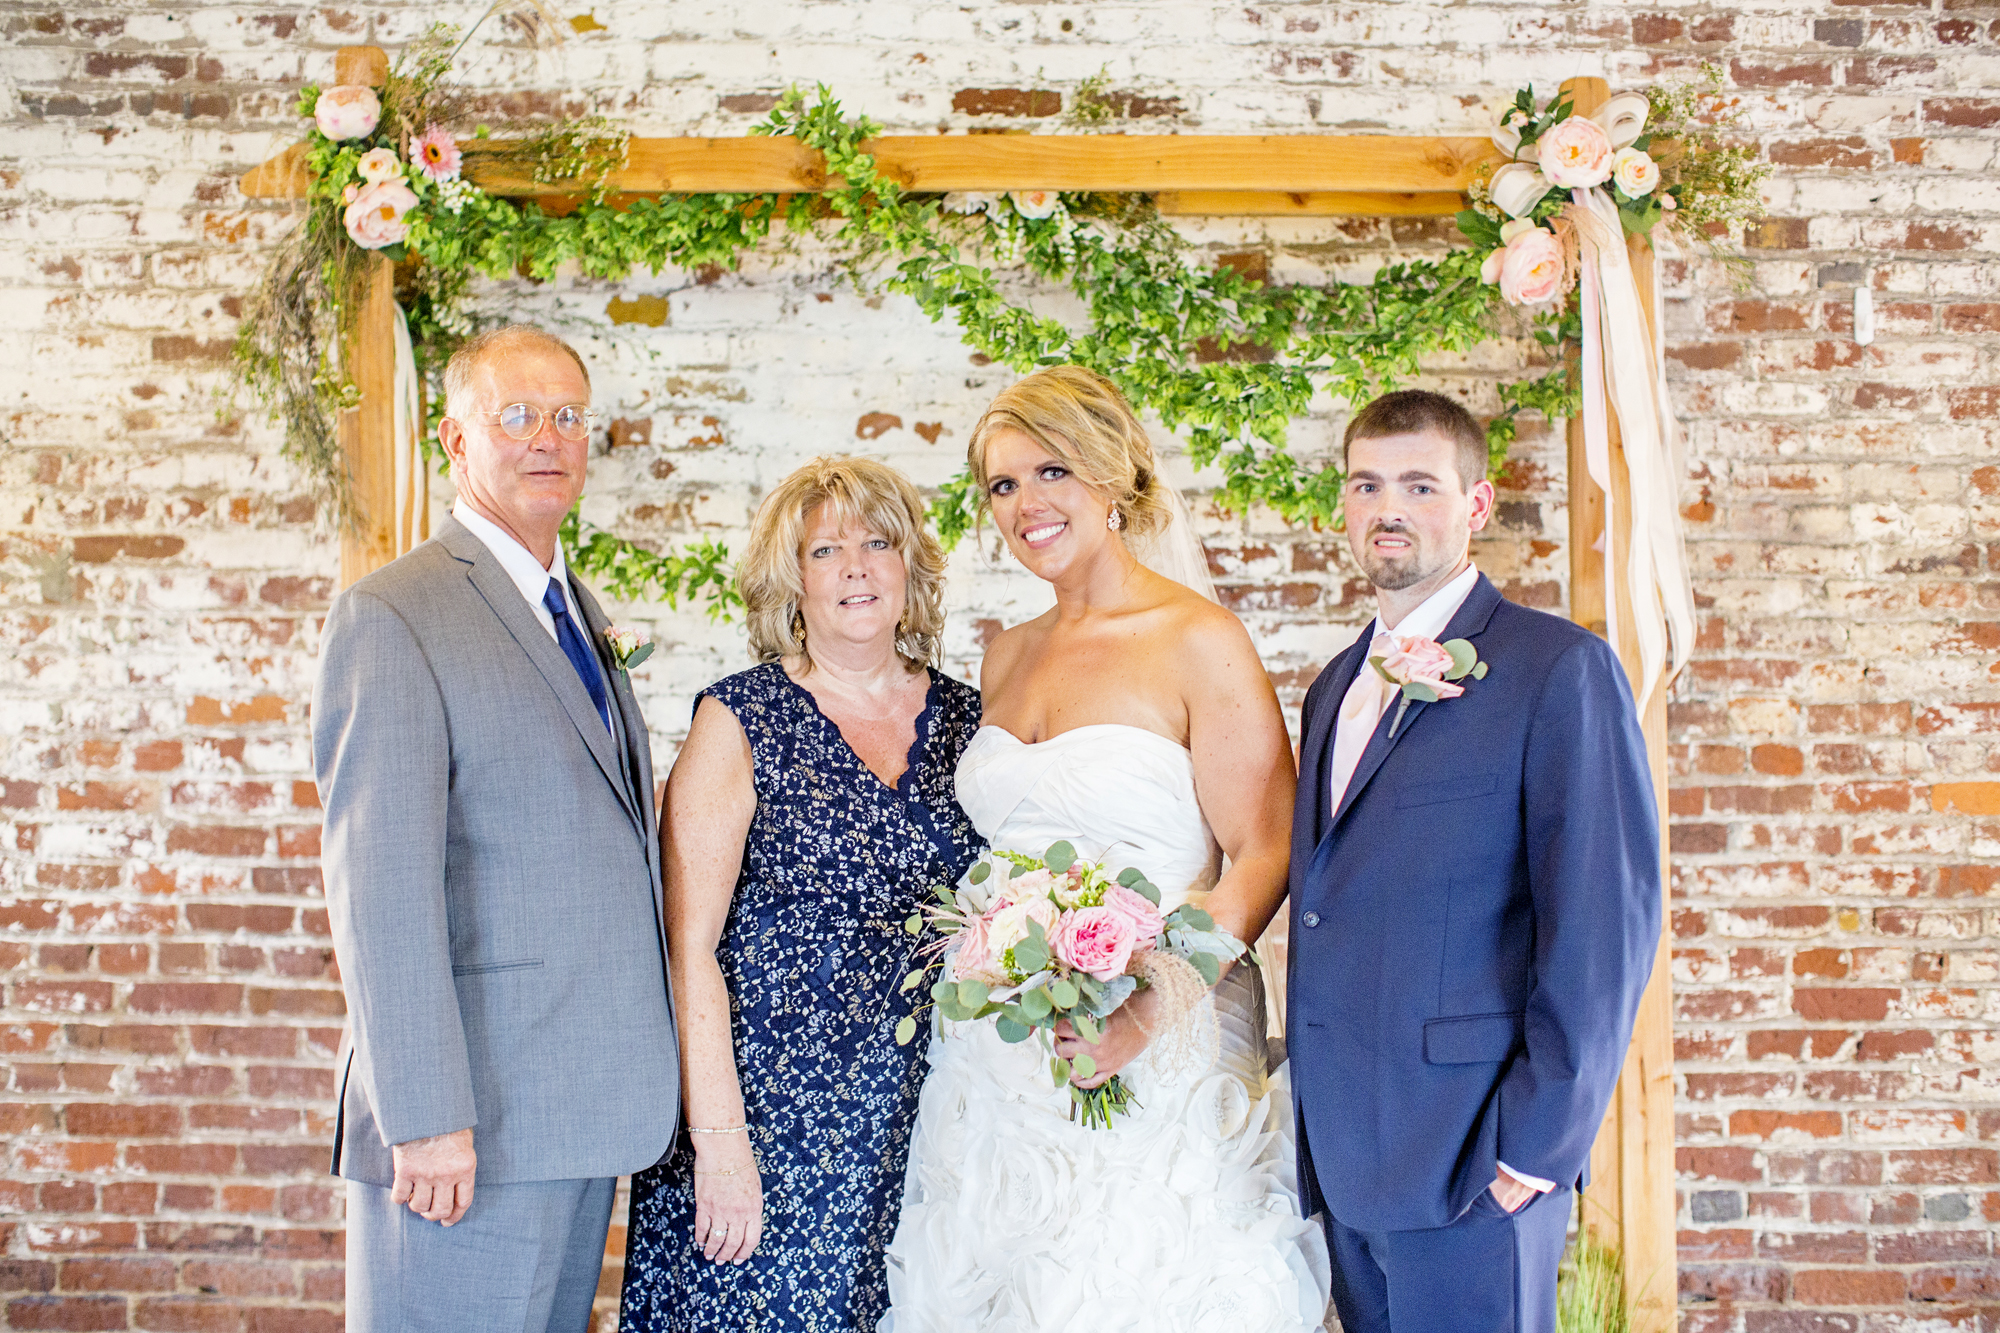 Seriously_Sabrina_Photography_Ashland_Kentucky_Train_Depot_Wedding_Parsons62.jpg